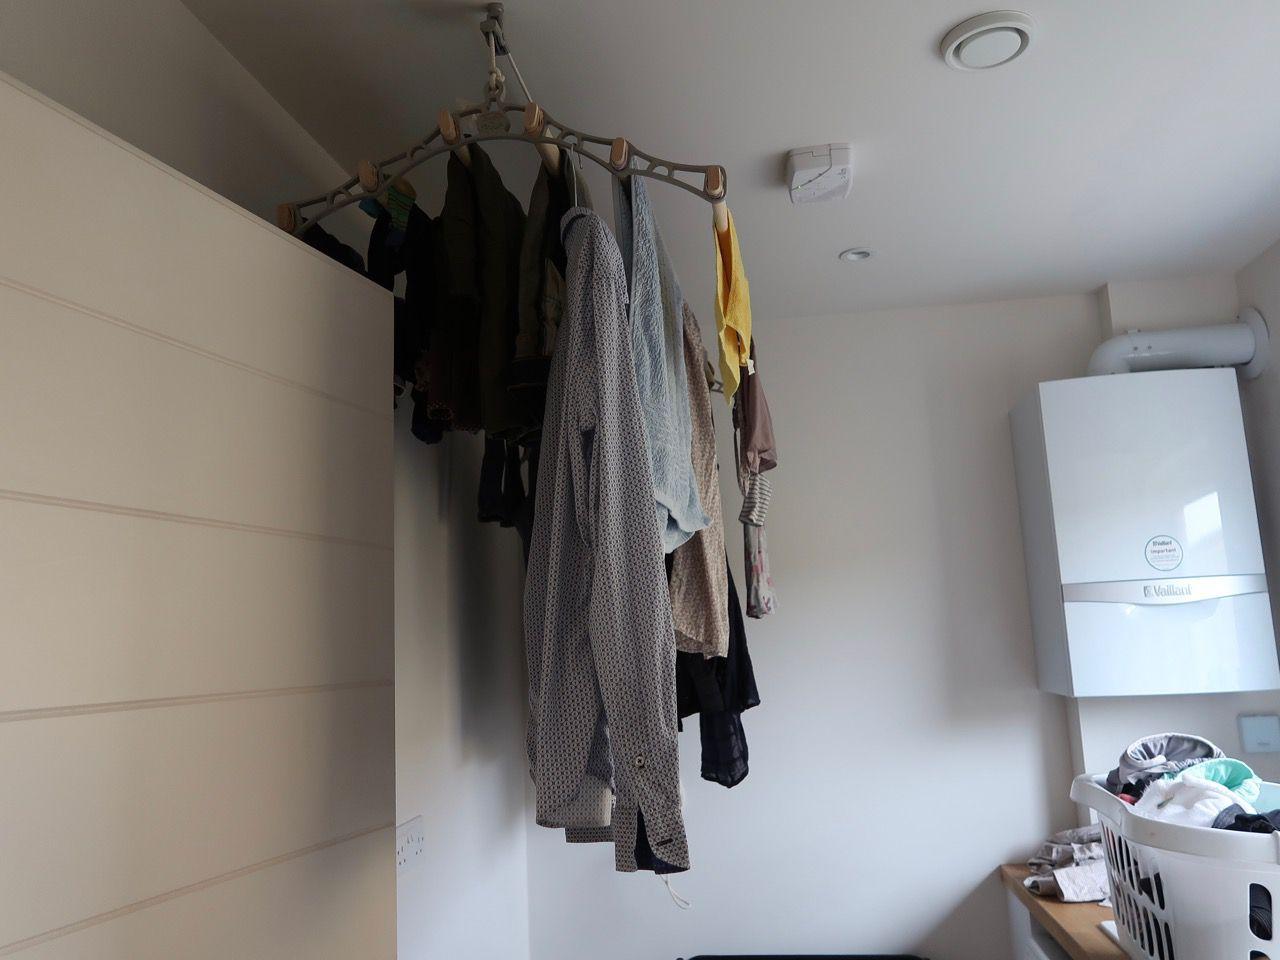 boiler in laundry room